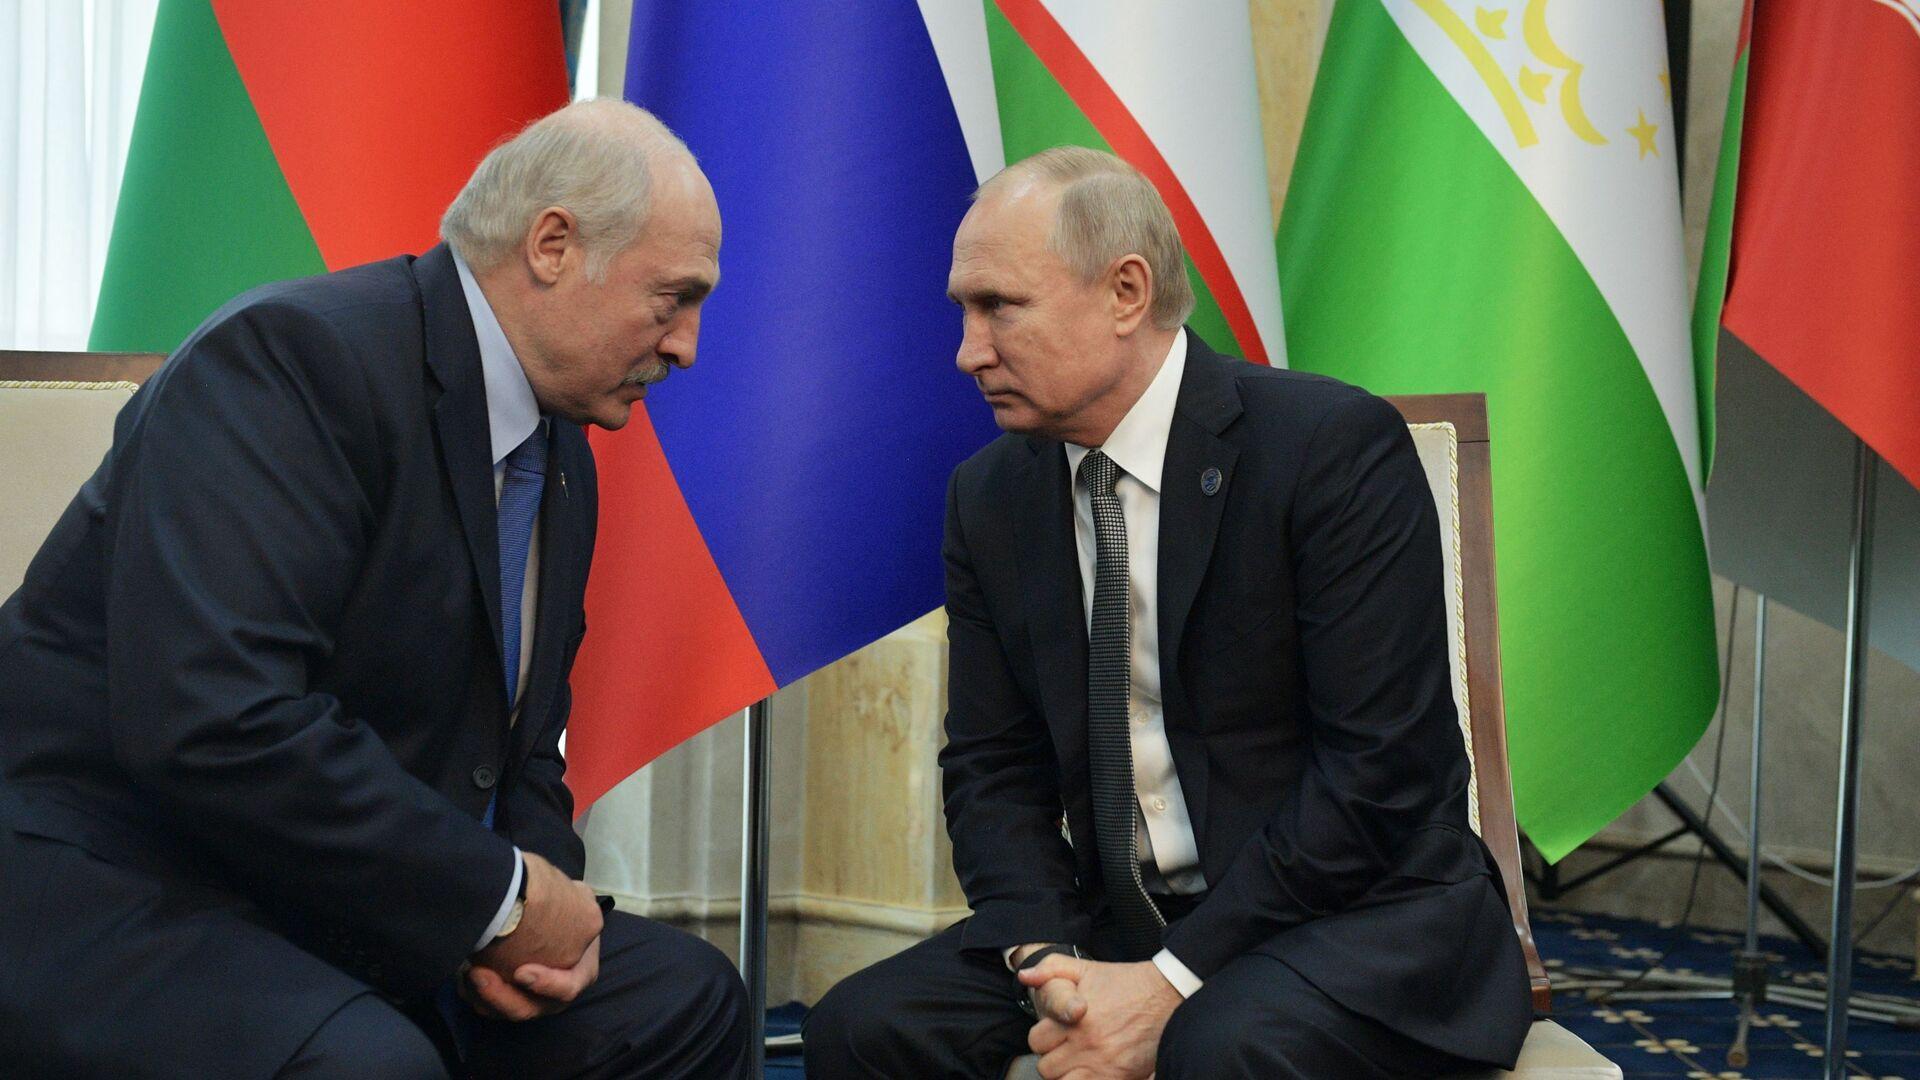 Putin e Lukashenko - Sputnik Italia, 1920, 12.09.2021